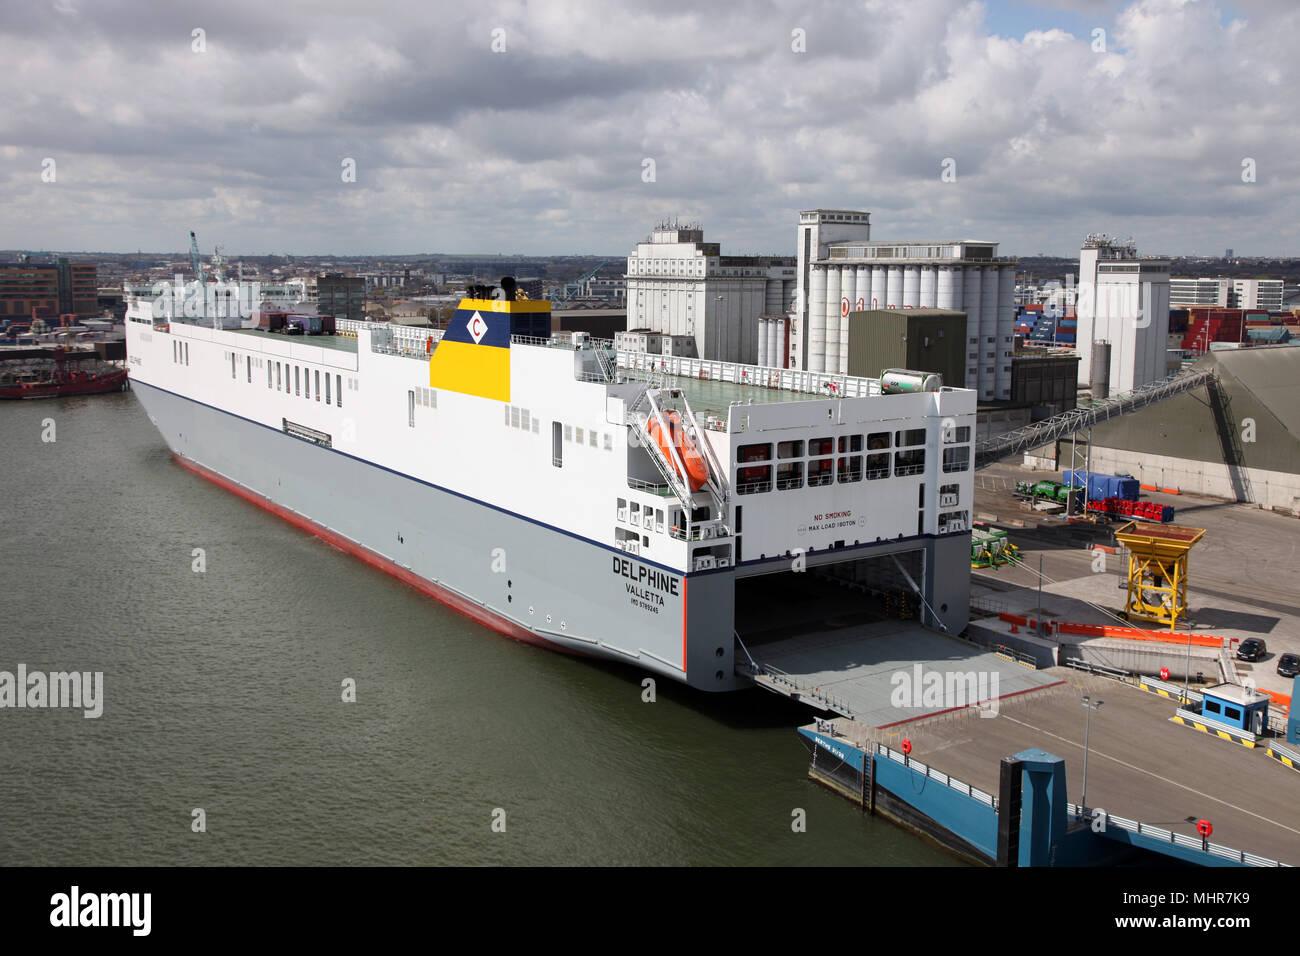 Delphine, Valetta, docked in Dublin Port, Ireland - Stock Image